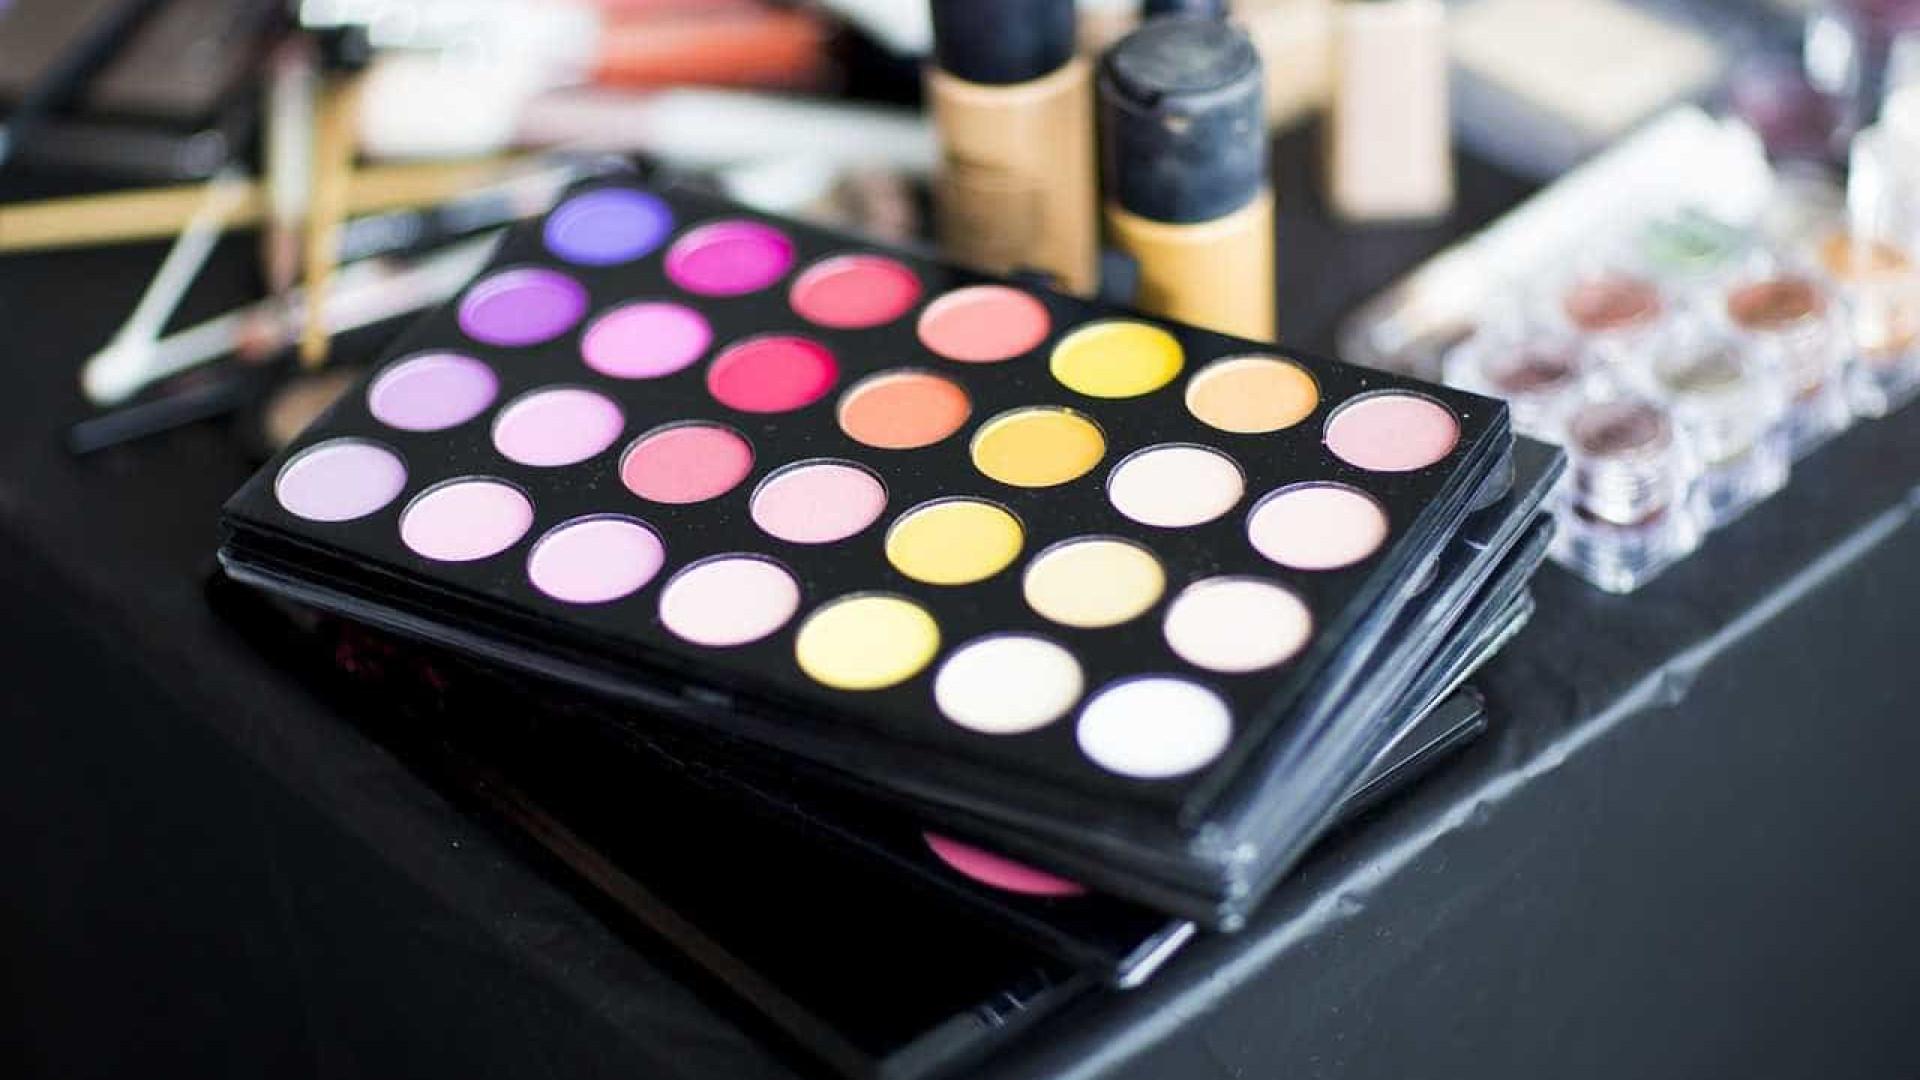 PF prende 2 em Cumbica com 7 quilos de cocaína em kits de maquiagem